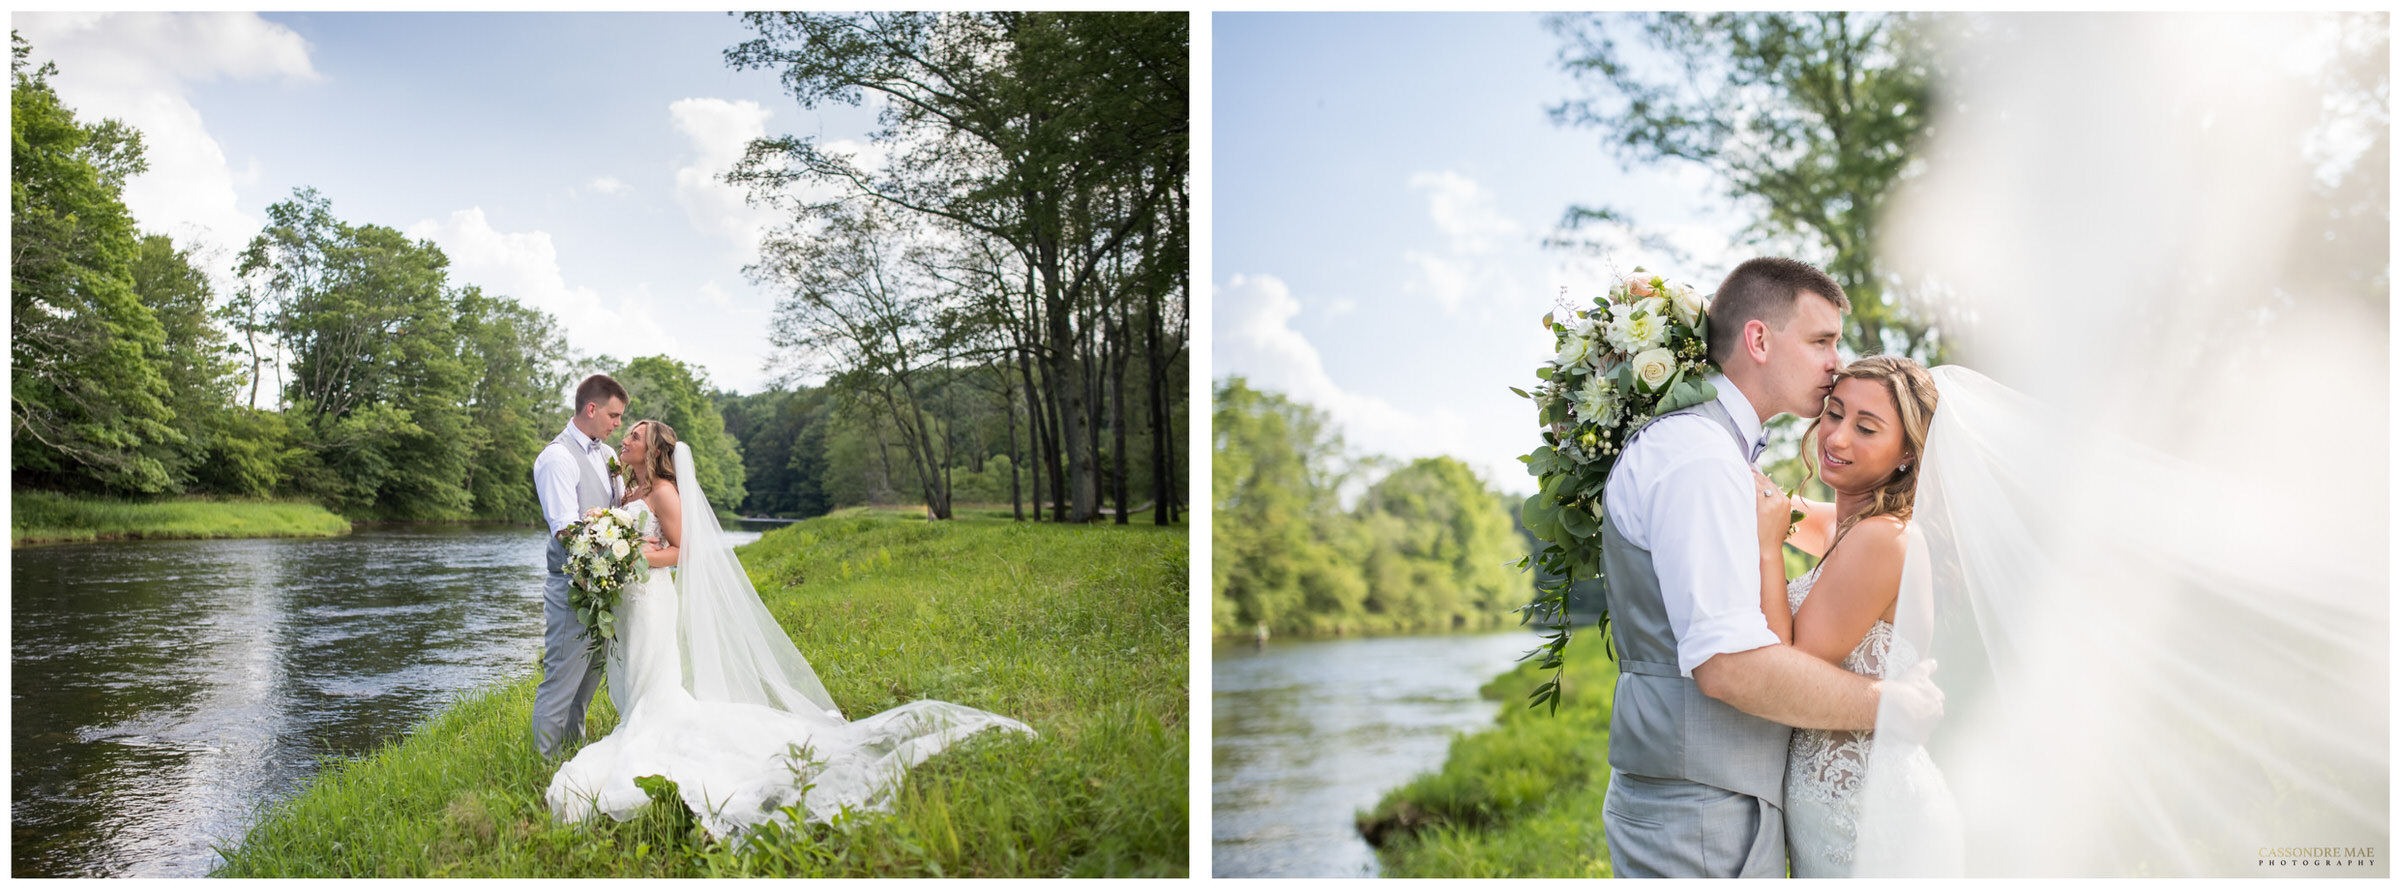 Cassondre Mae Photography Hudson Valley Wedding 28.jpg